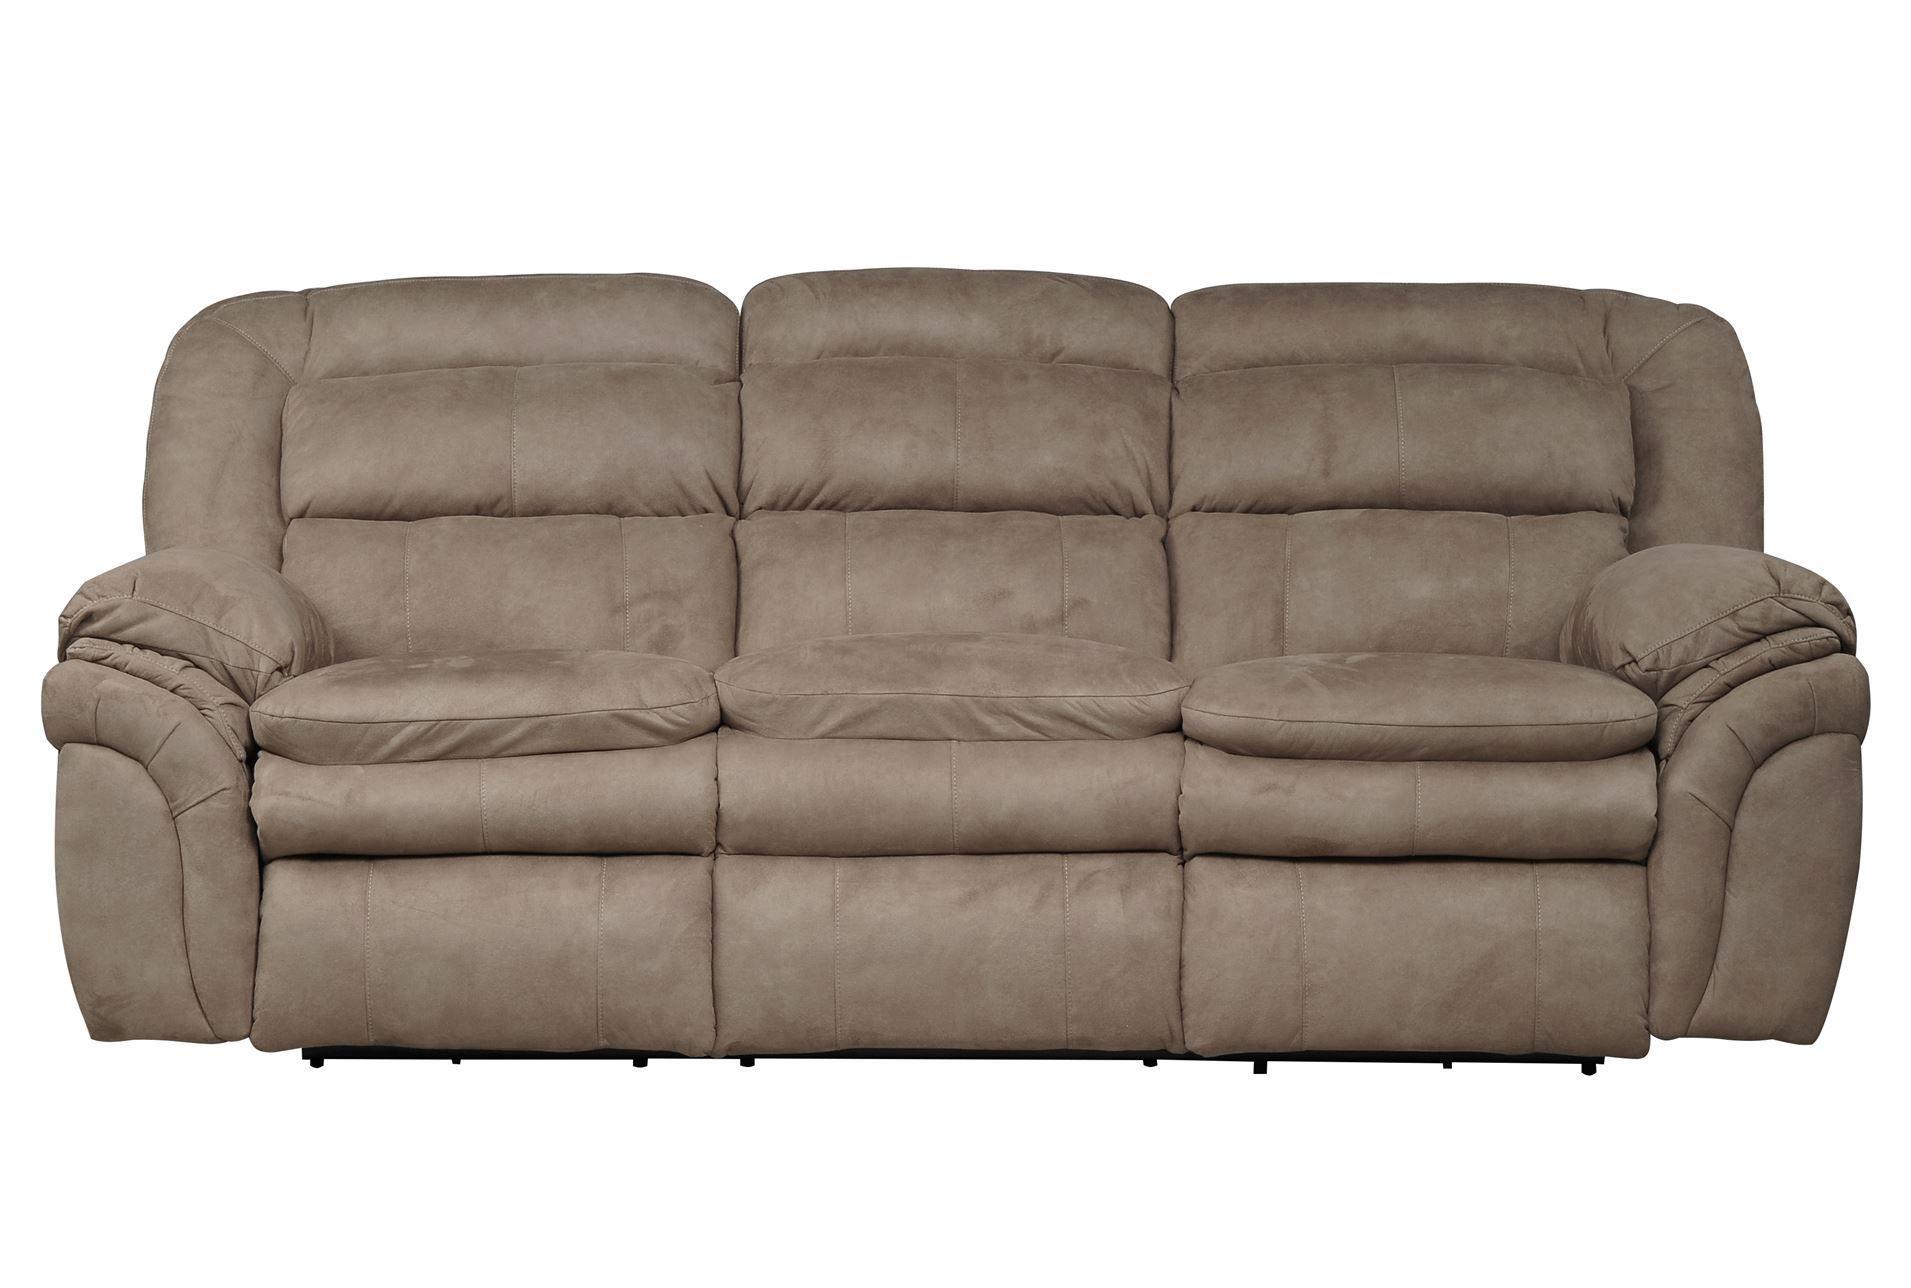 Emmett Power Reclining Sofa For the Home Pinterest